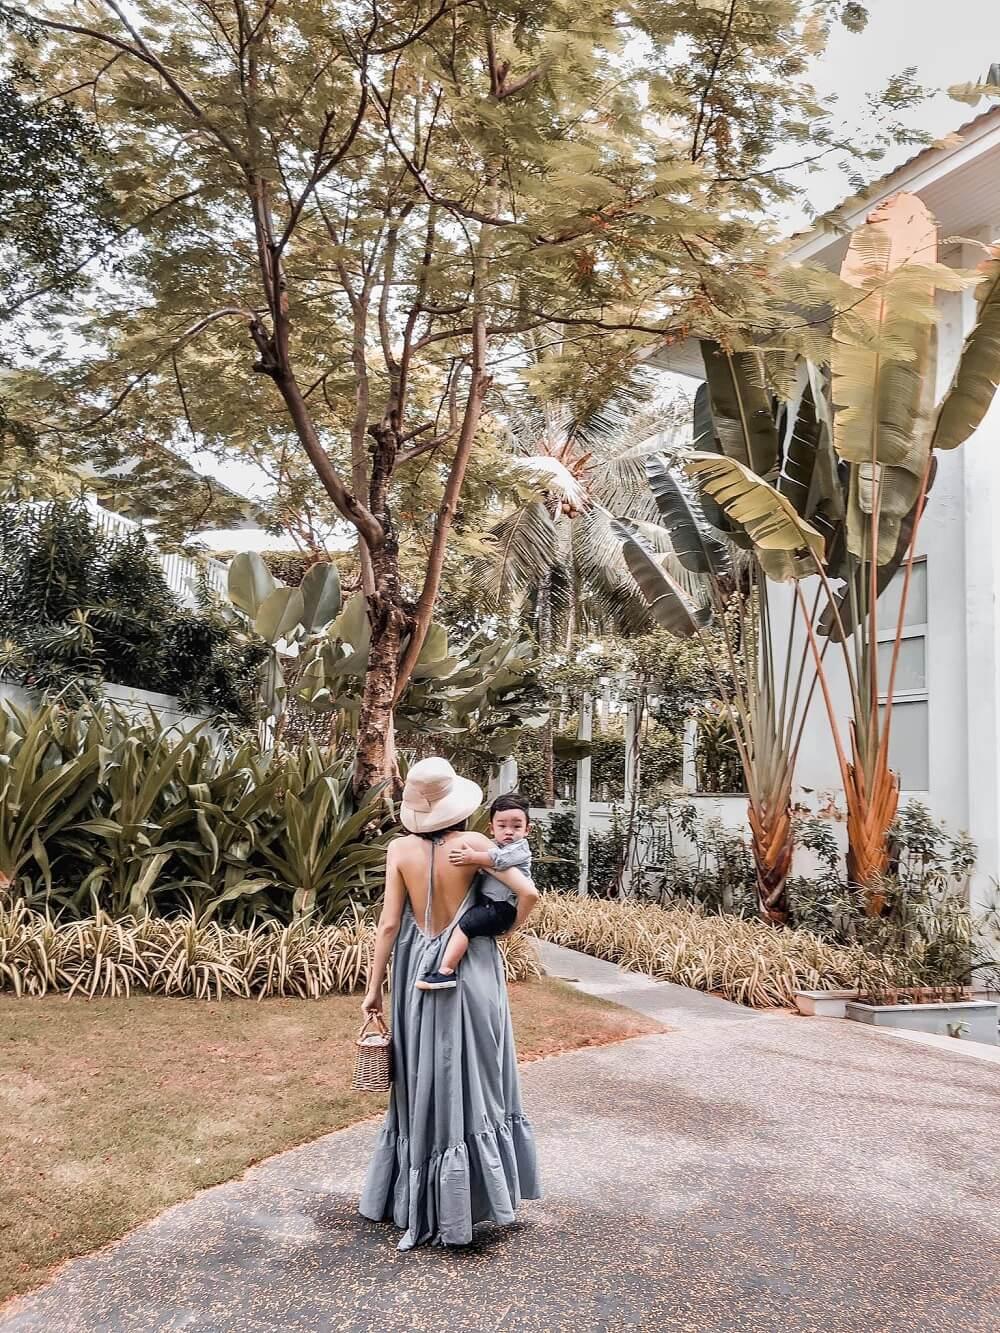 Premier Village Danang Resort Managed By Accorhotels Review Kinh Nghiem Du Lich Da Nang Cho Gia Dinh Co Con Nho Danang Fantasticity Com 019